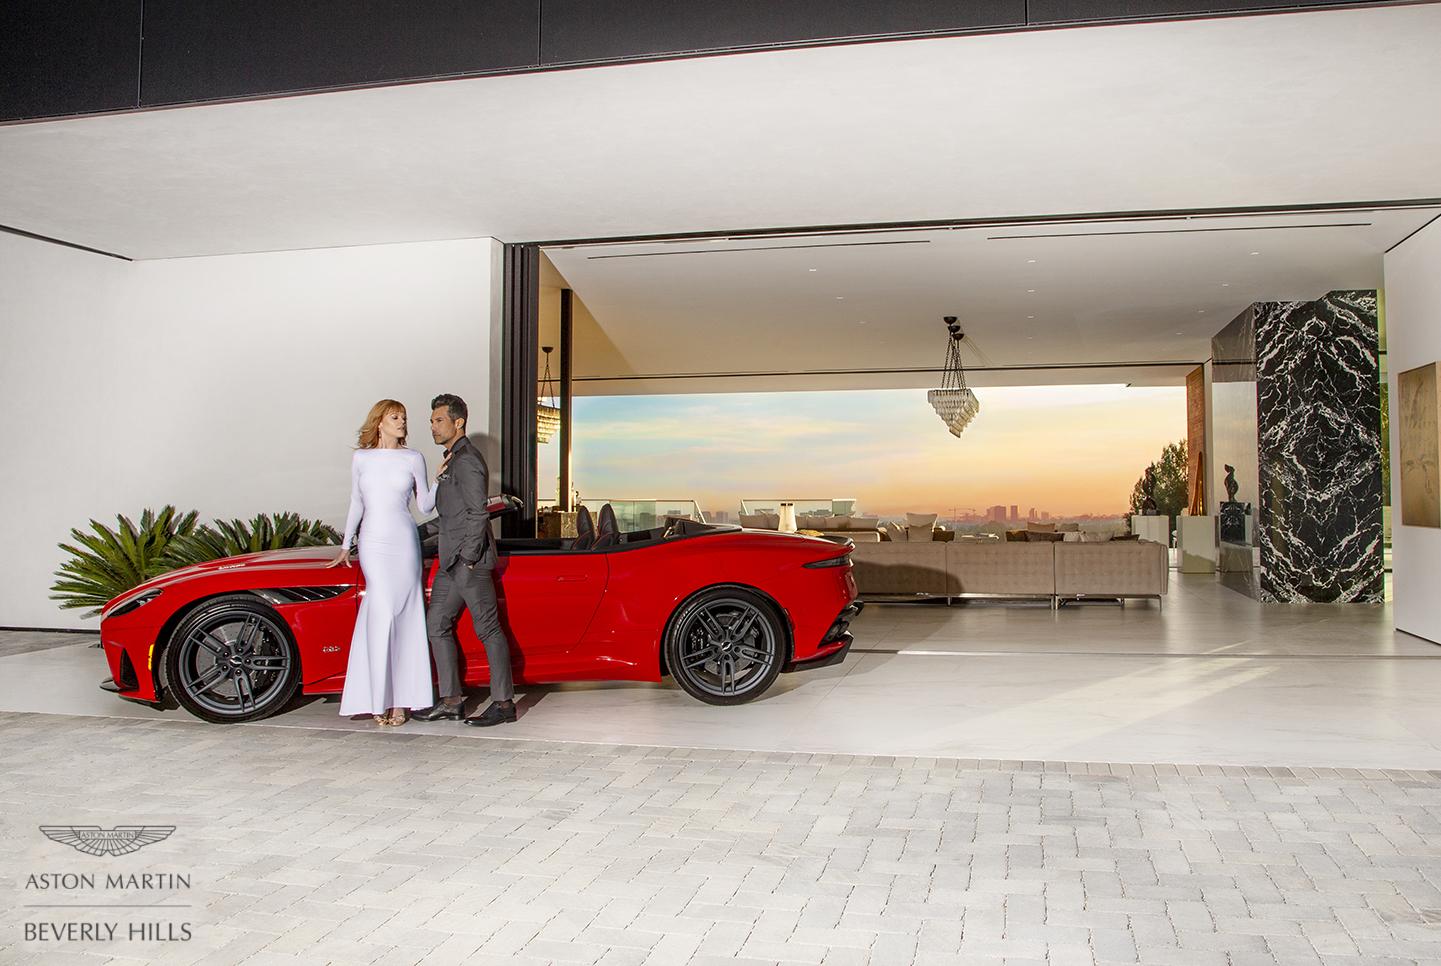 Aston Martin Advertisment